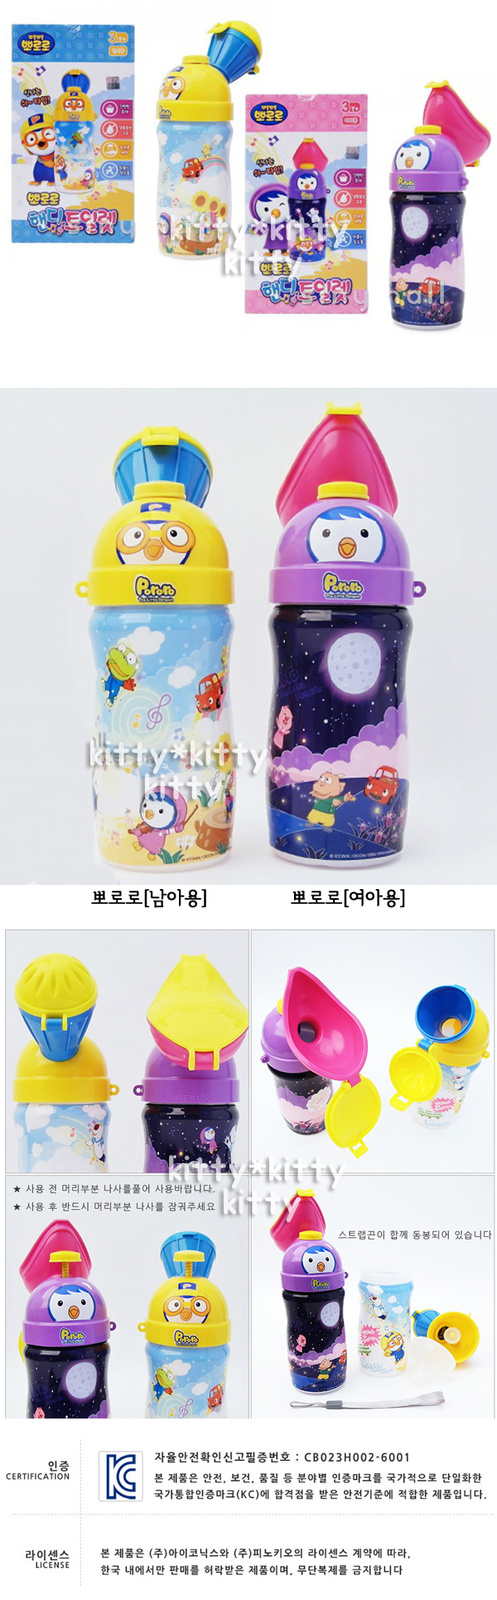 Pororo PORORO Handy Mini Kids Toilet / Bottle Shaped Kids Toilet / Portable Toil